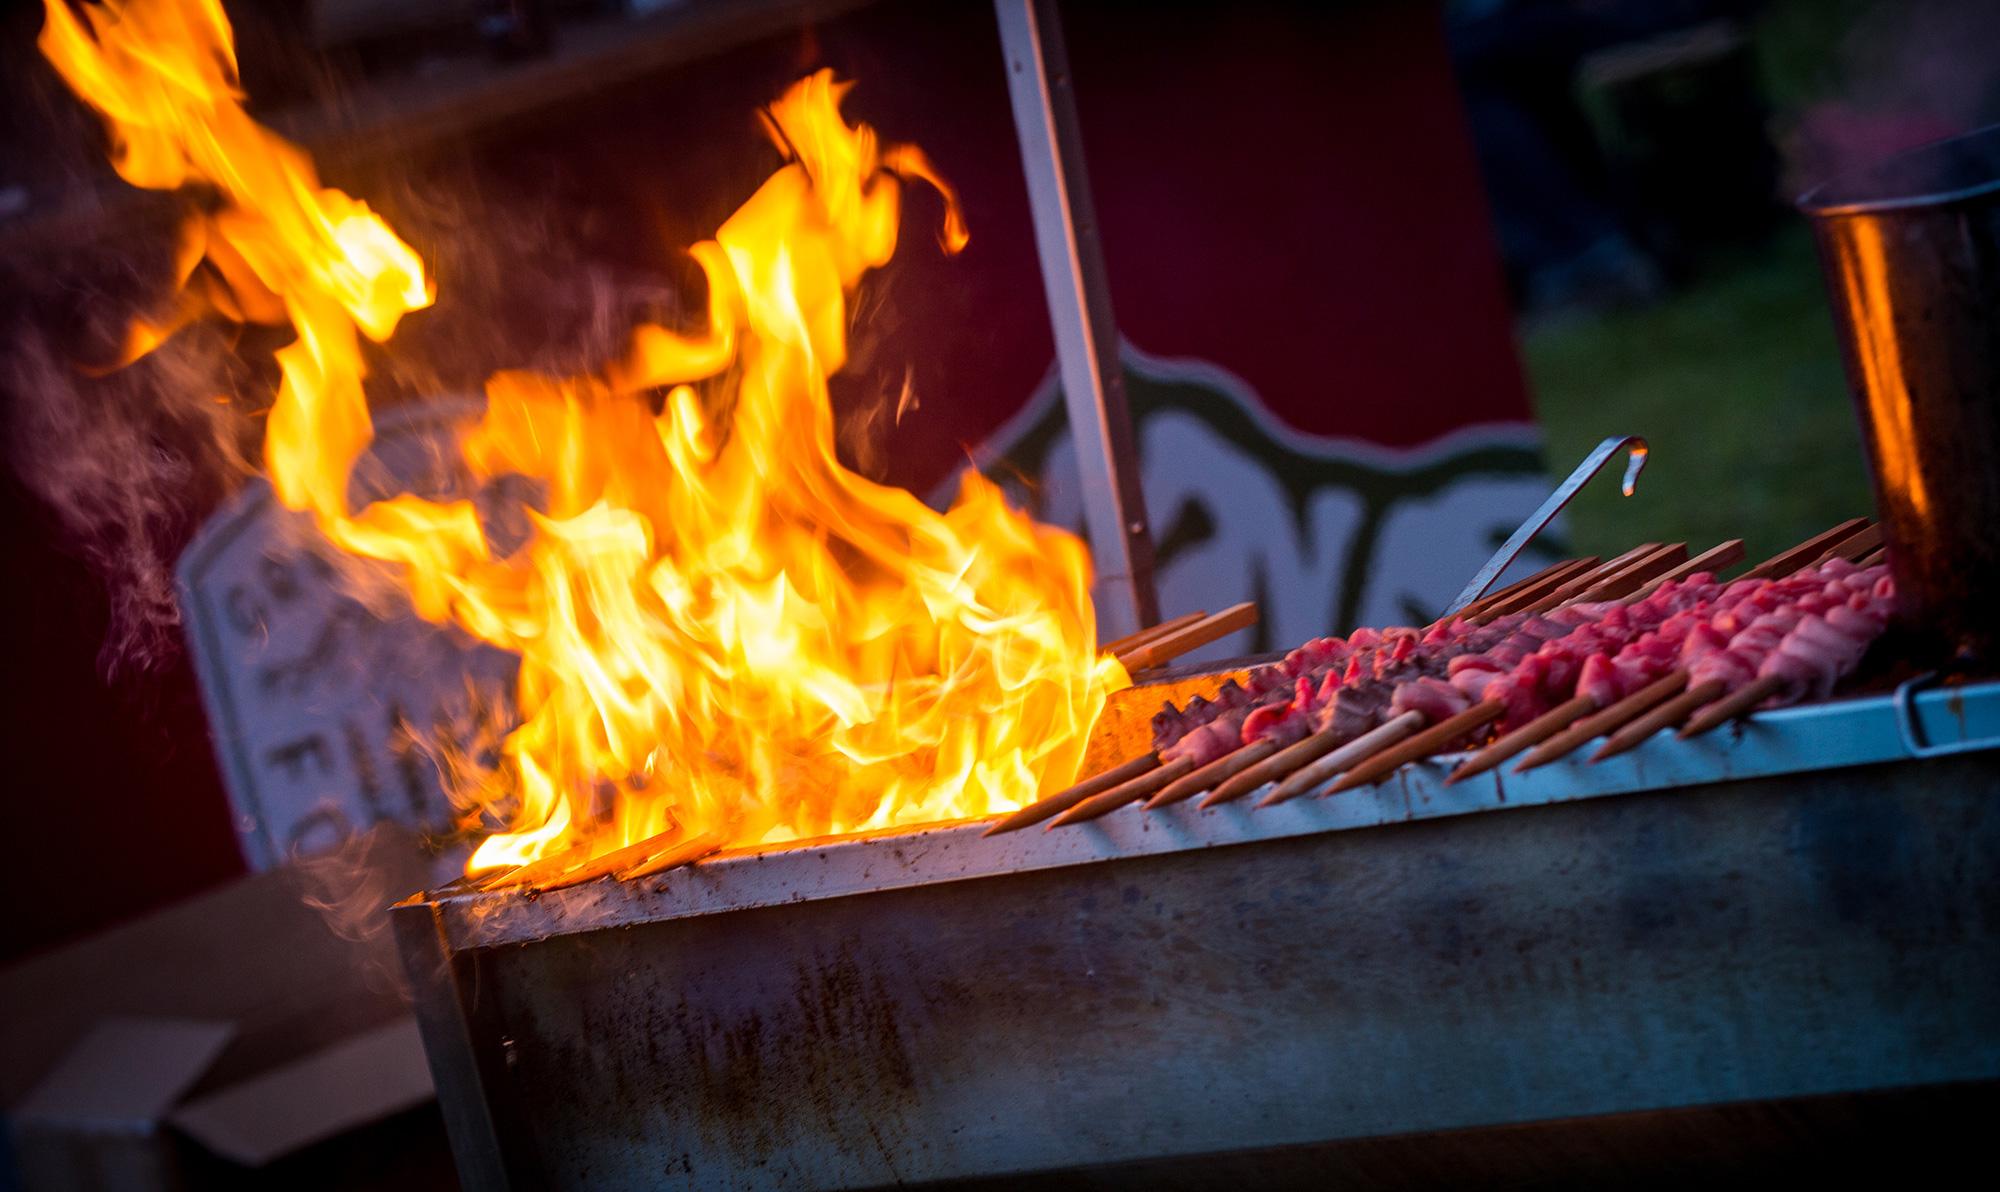 peduzzi zigeunerspiess steilalva grill rauch action